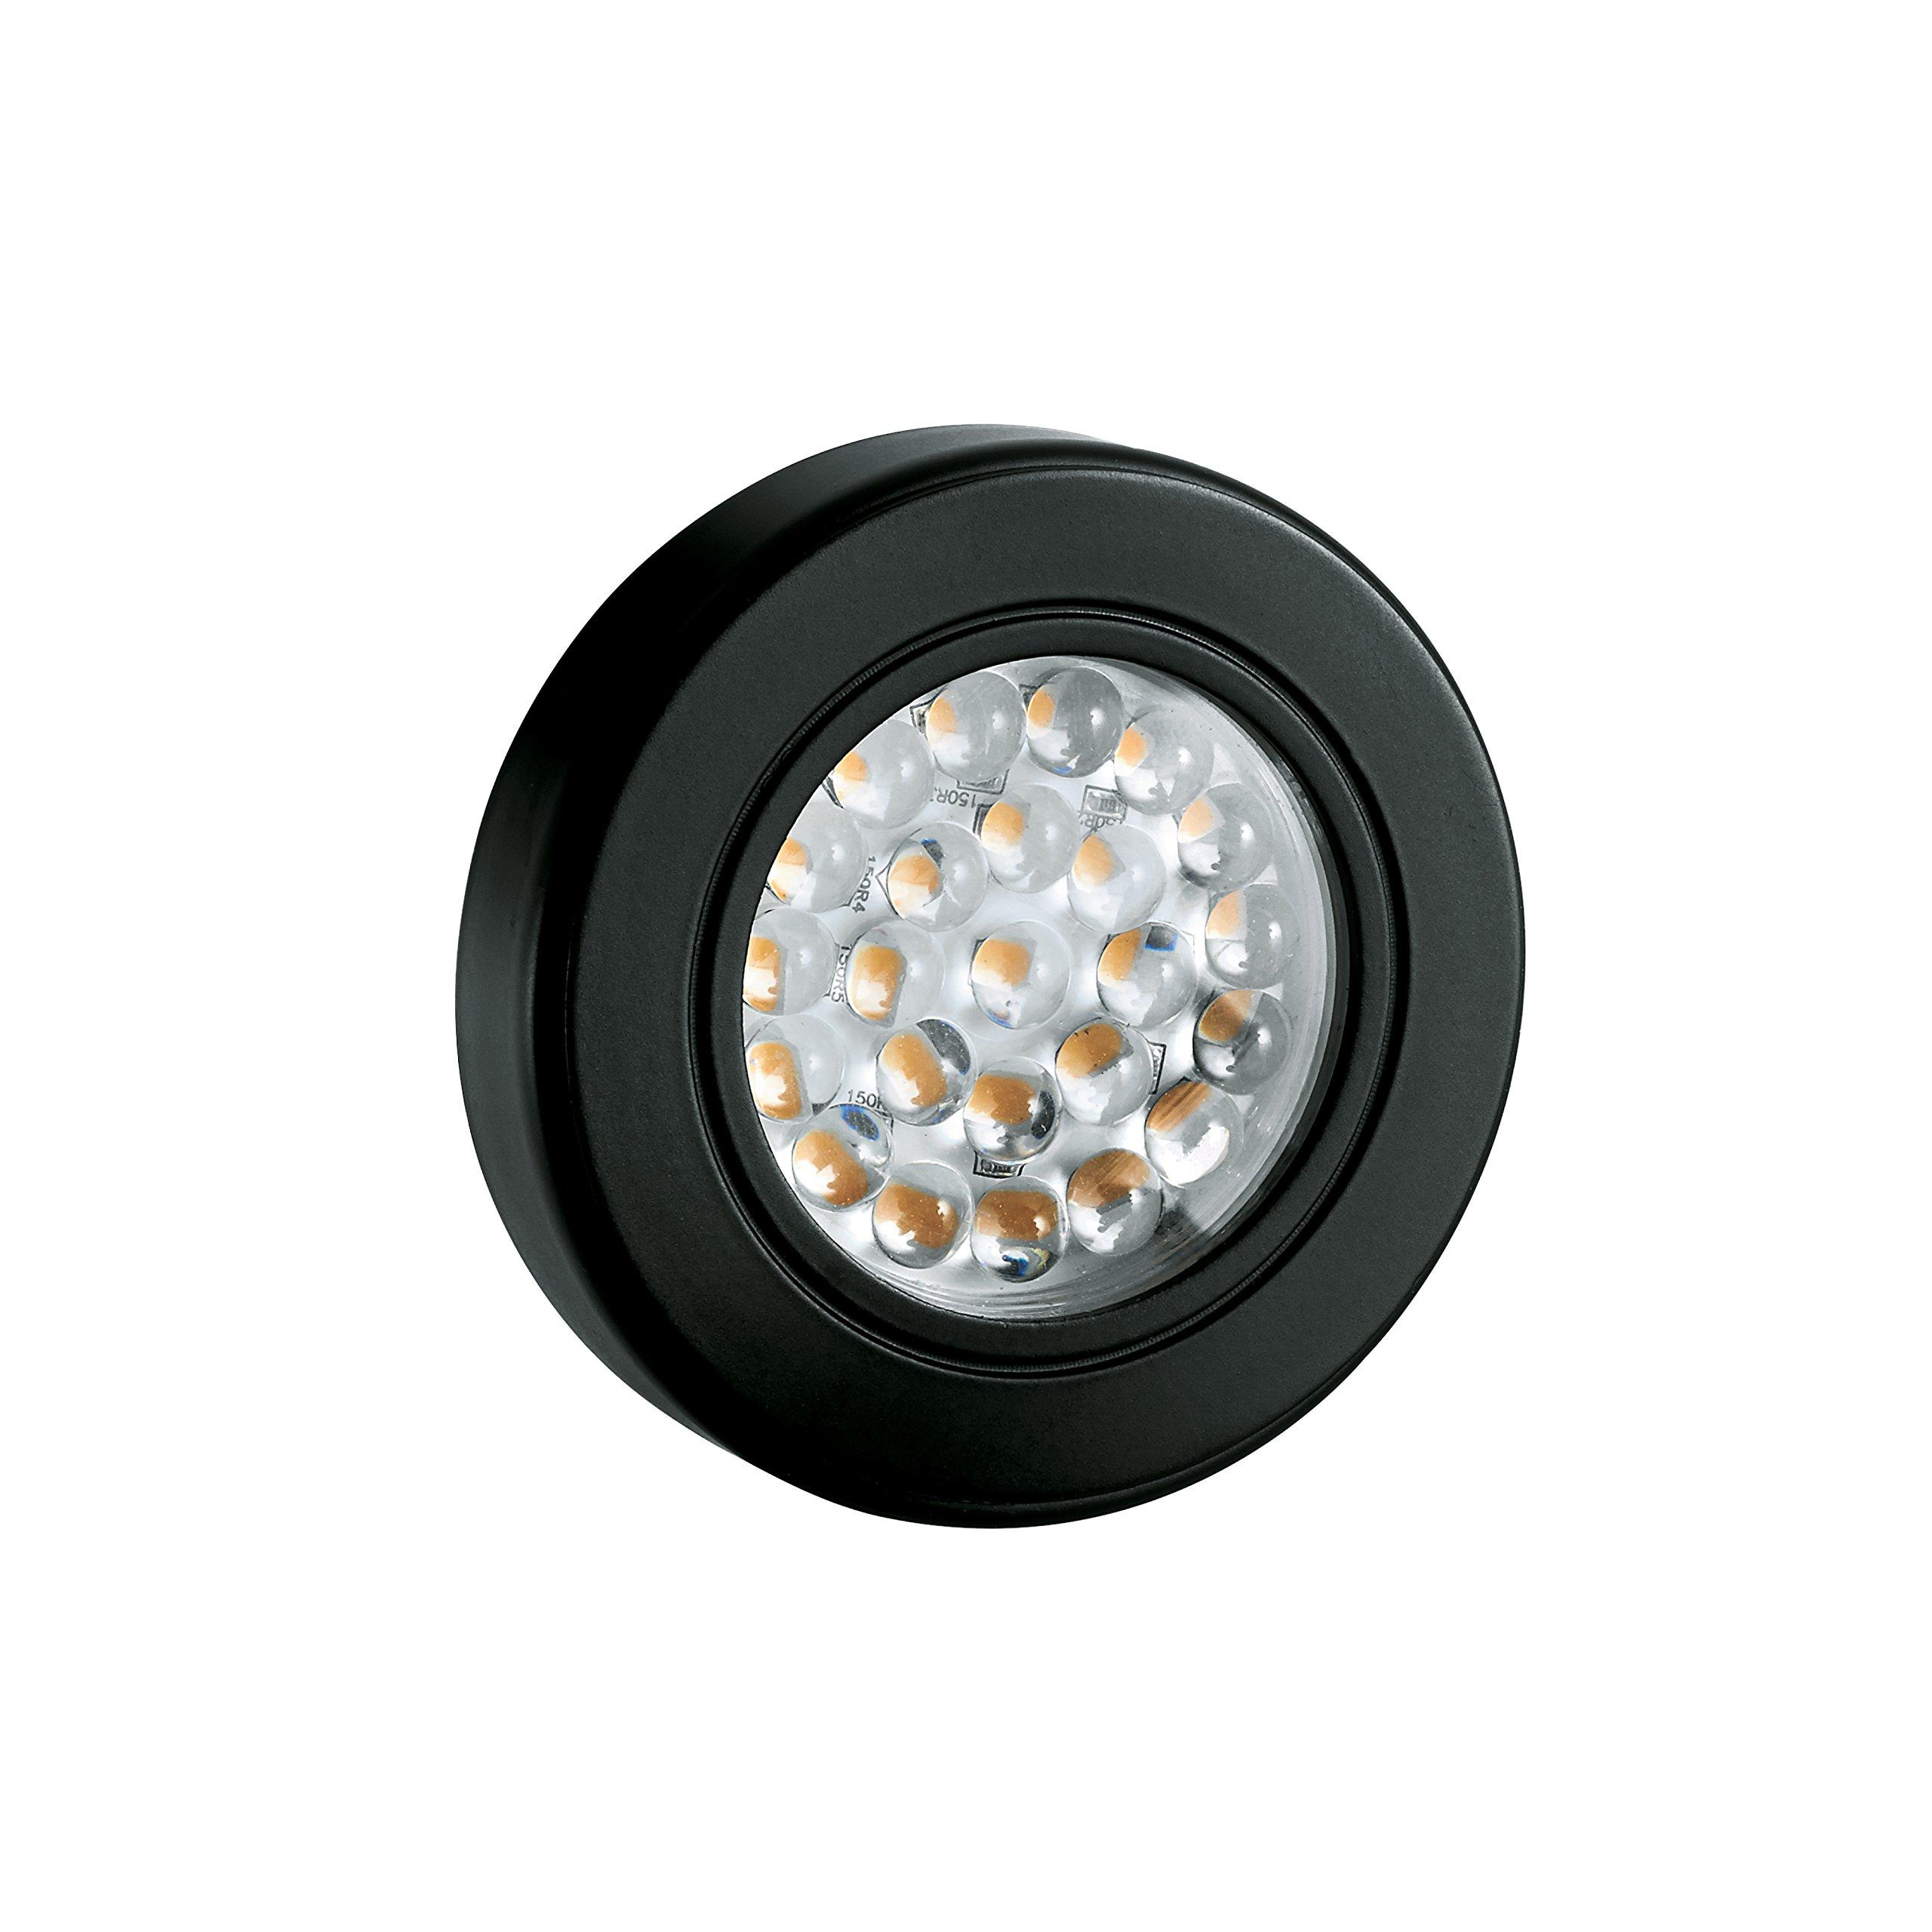 Tresco Lighting L-1EQPCBL-KIT 12V DC UL Safety Listed Cabinet Lighting with 2.5W EquiLine Puck Light, Black